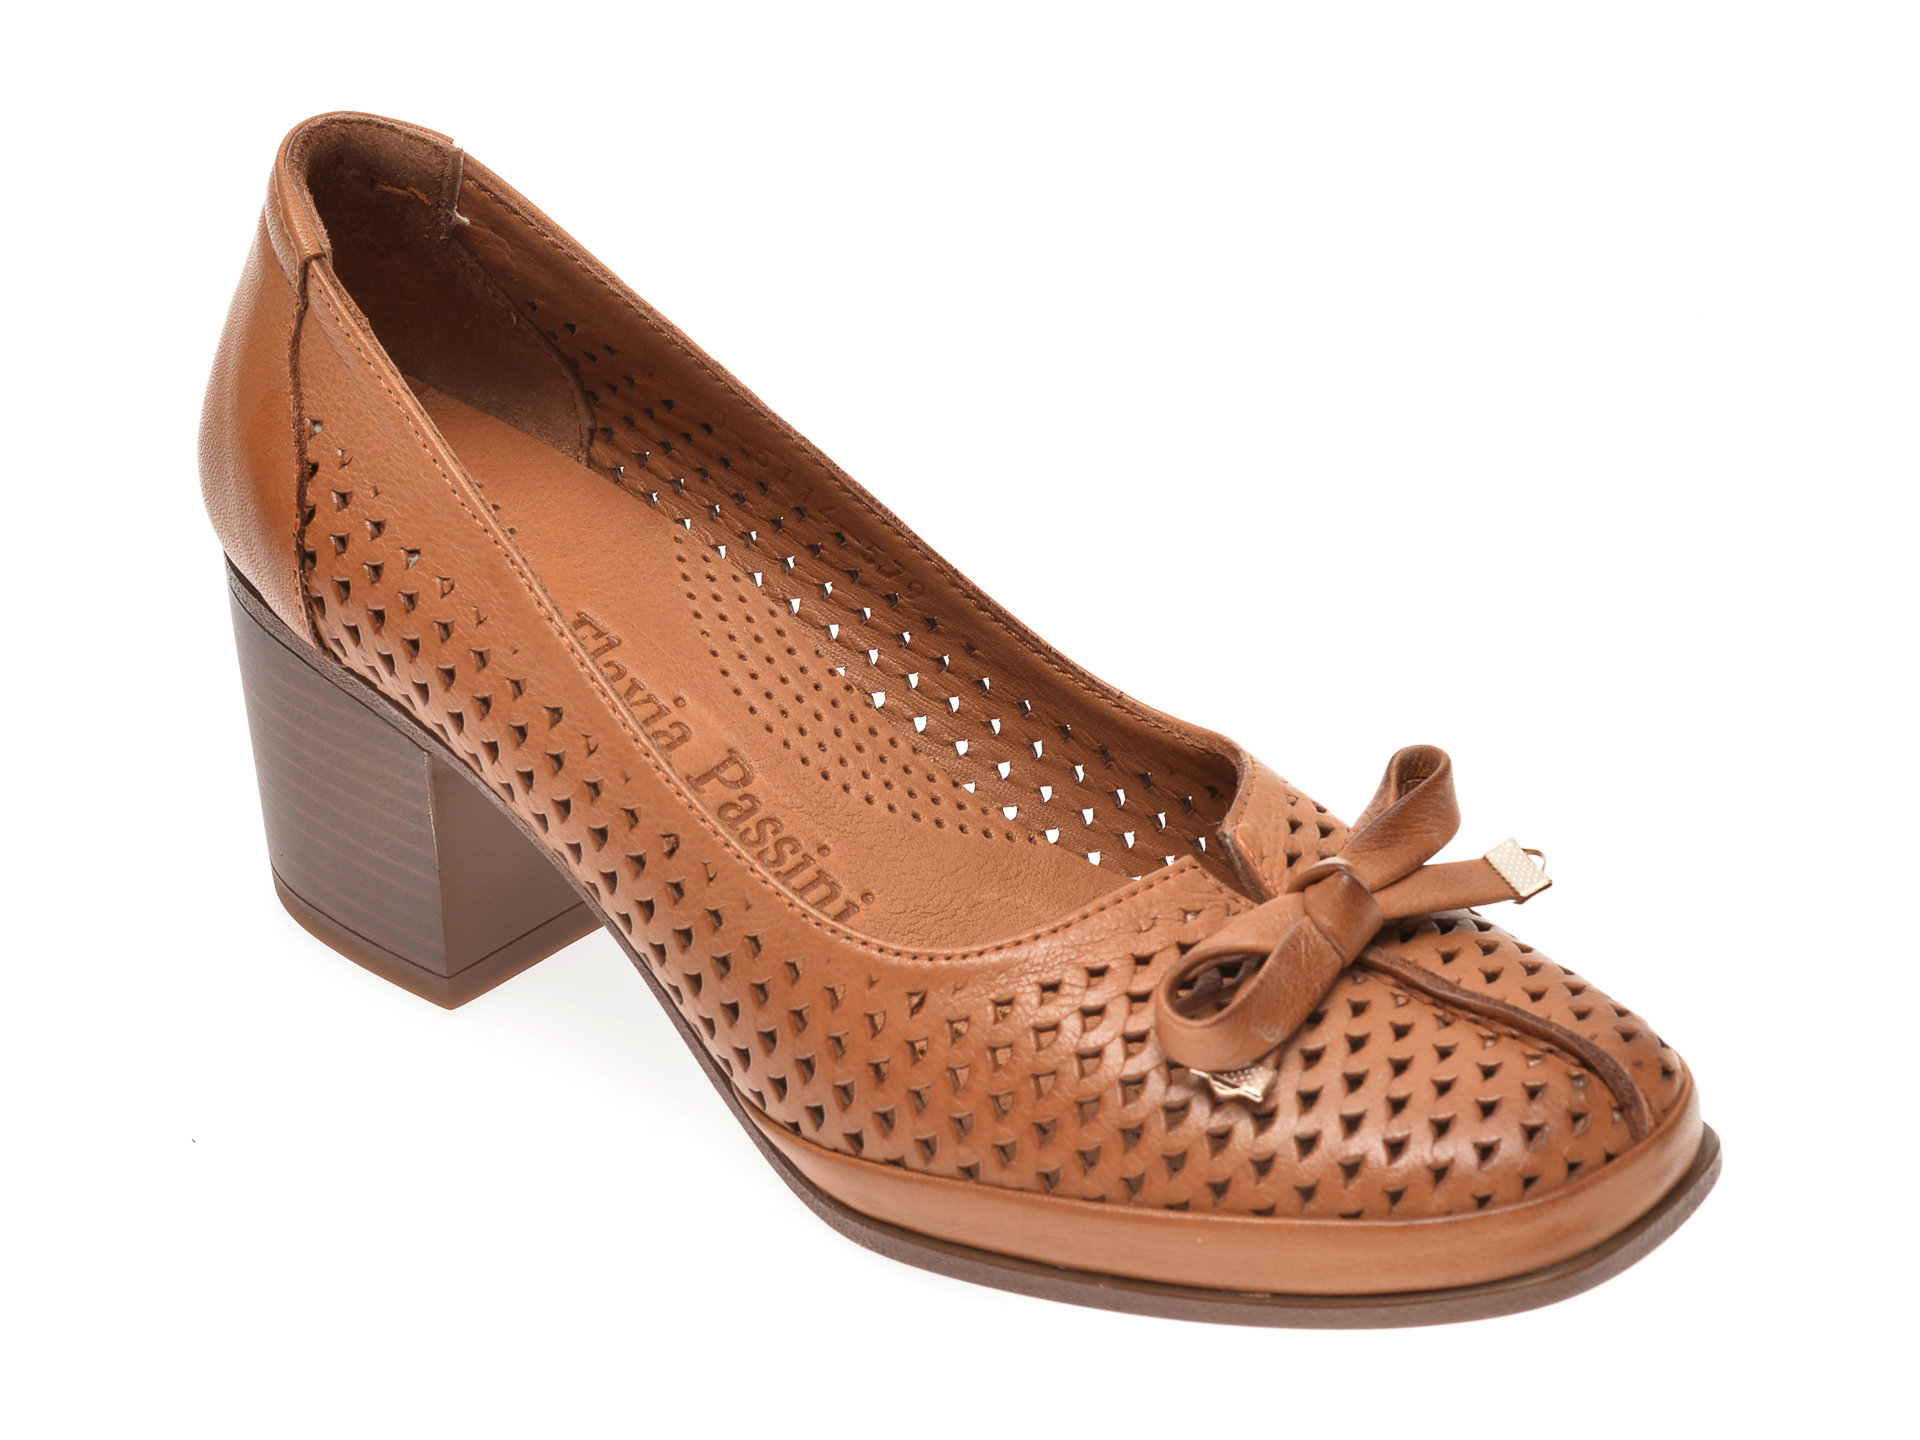 Pantofi FLAVIA PASSINI coniac, 0105114, din piele naturala imagine